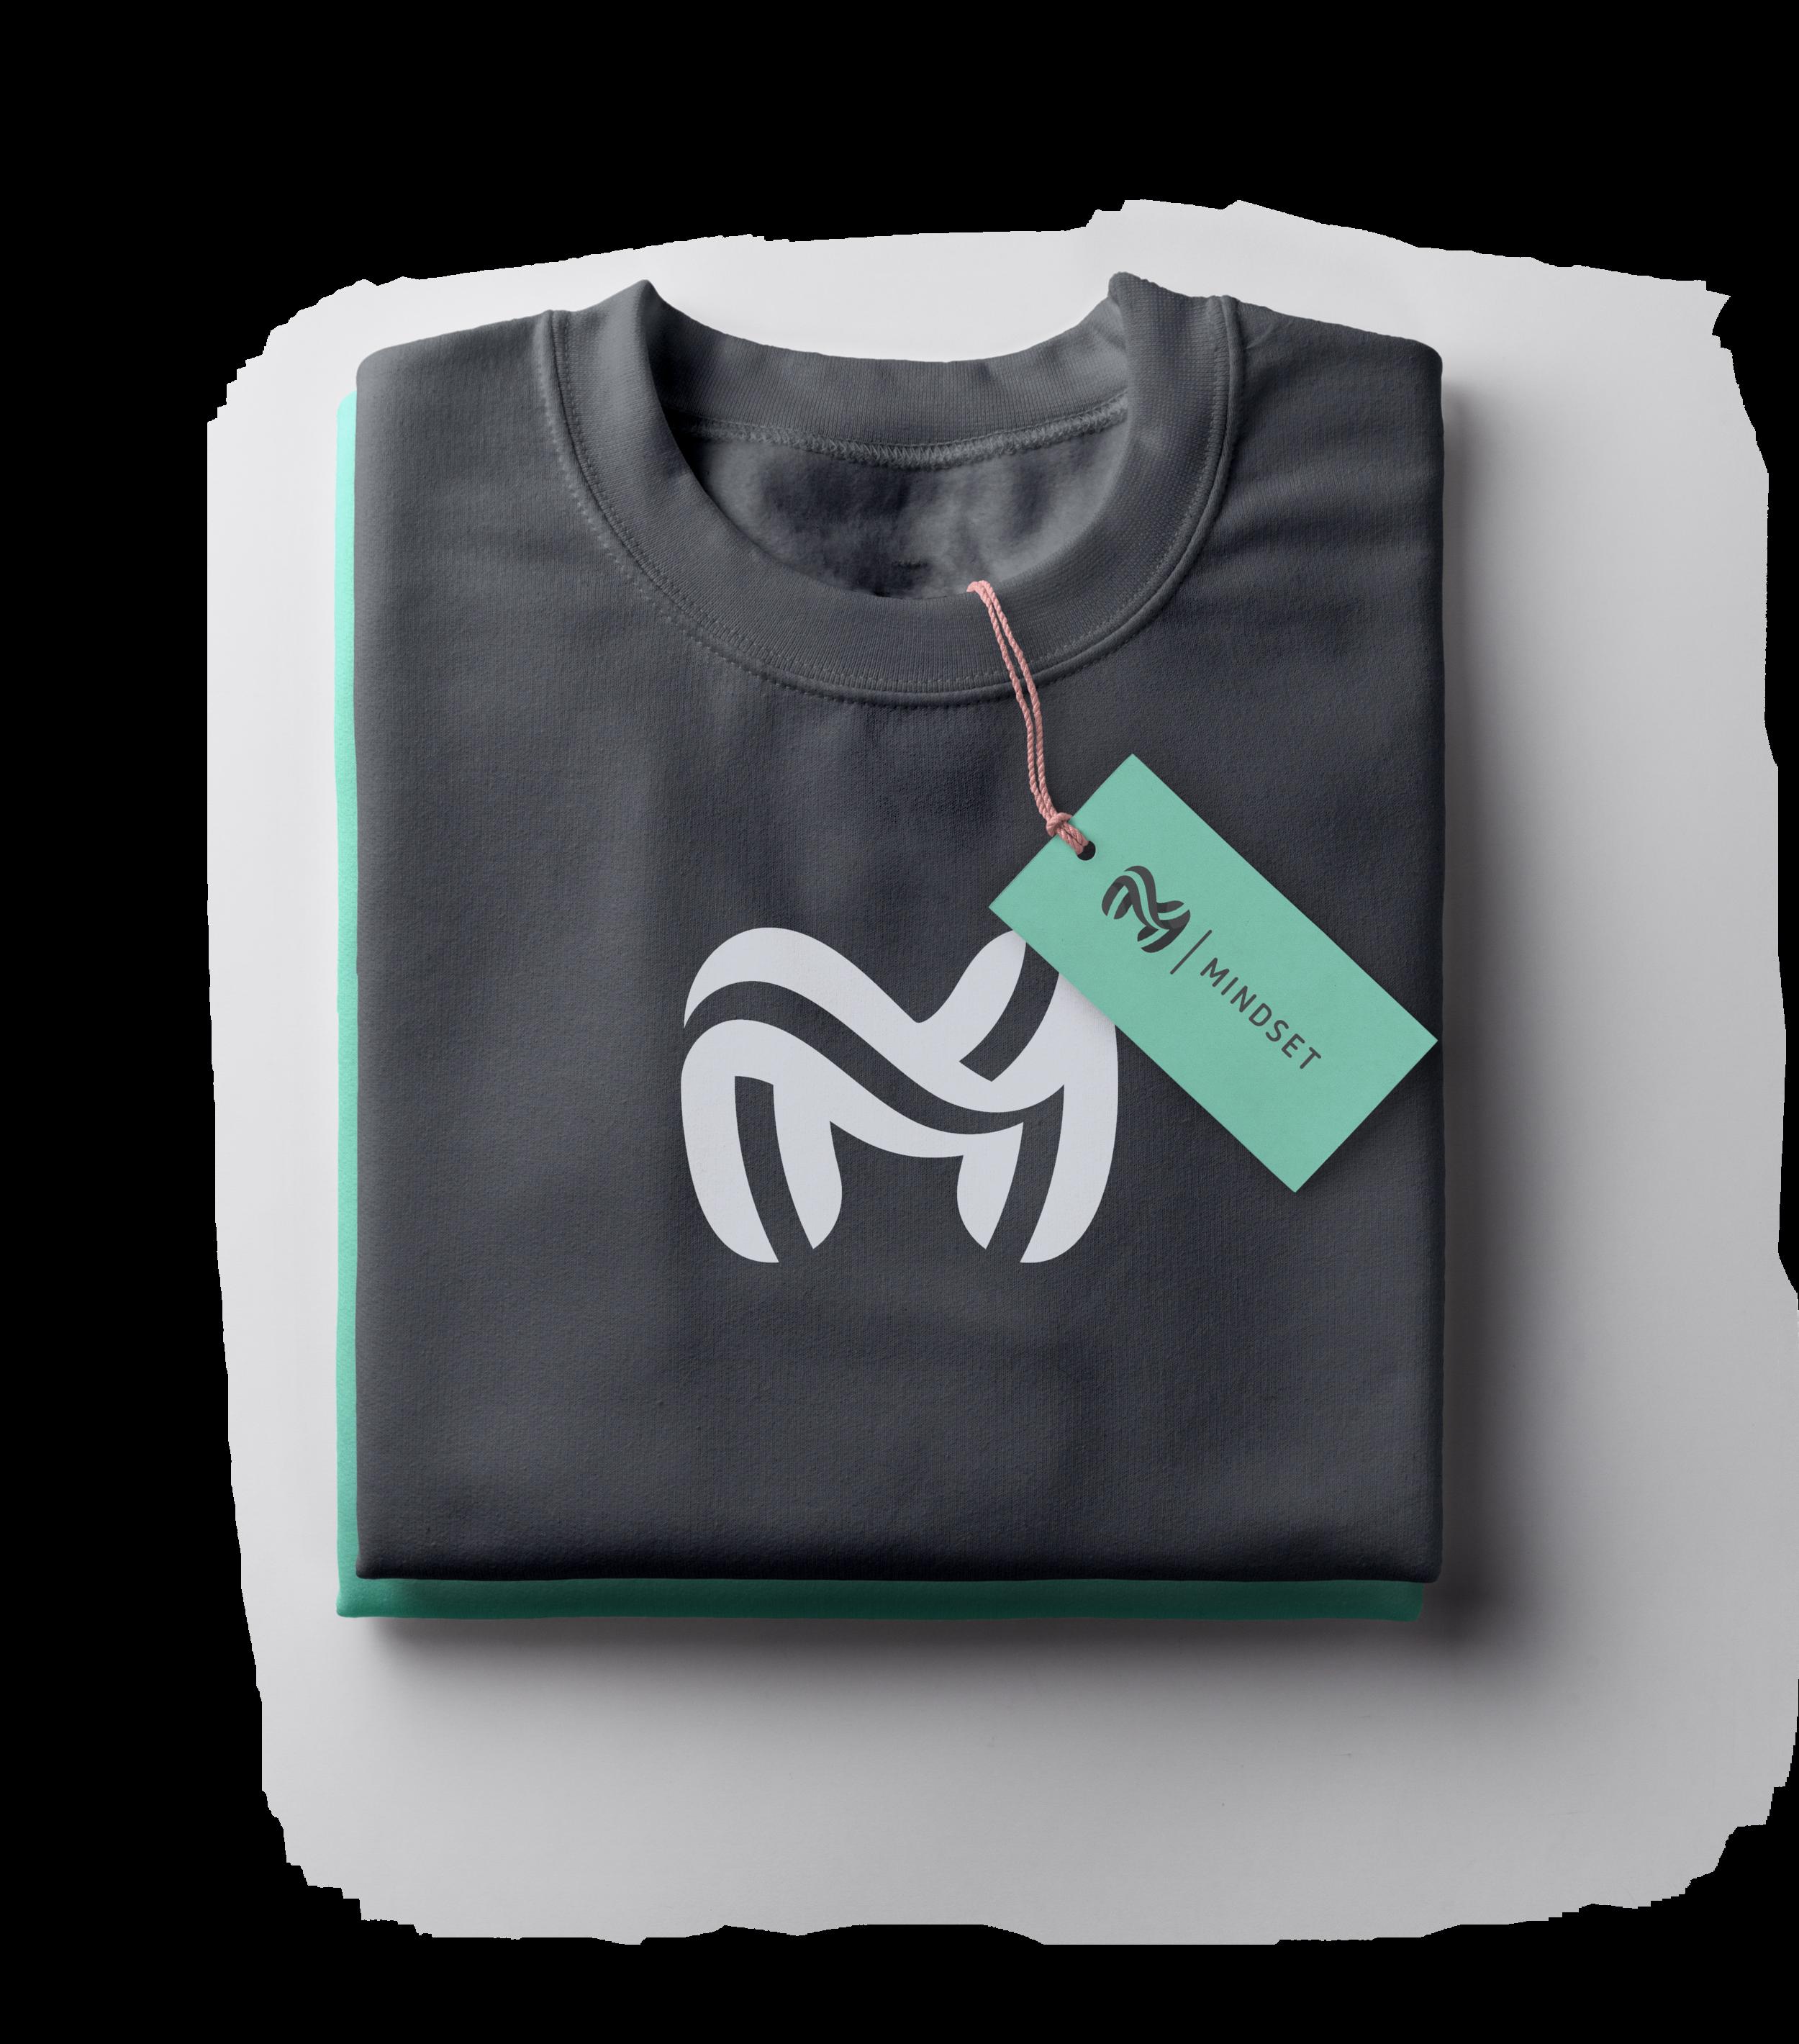 mindset folded t-shirt mockup.png